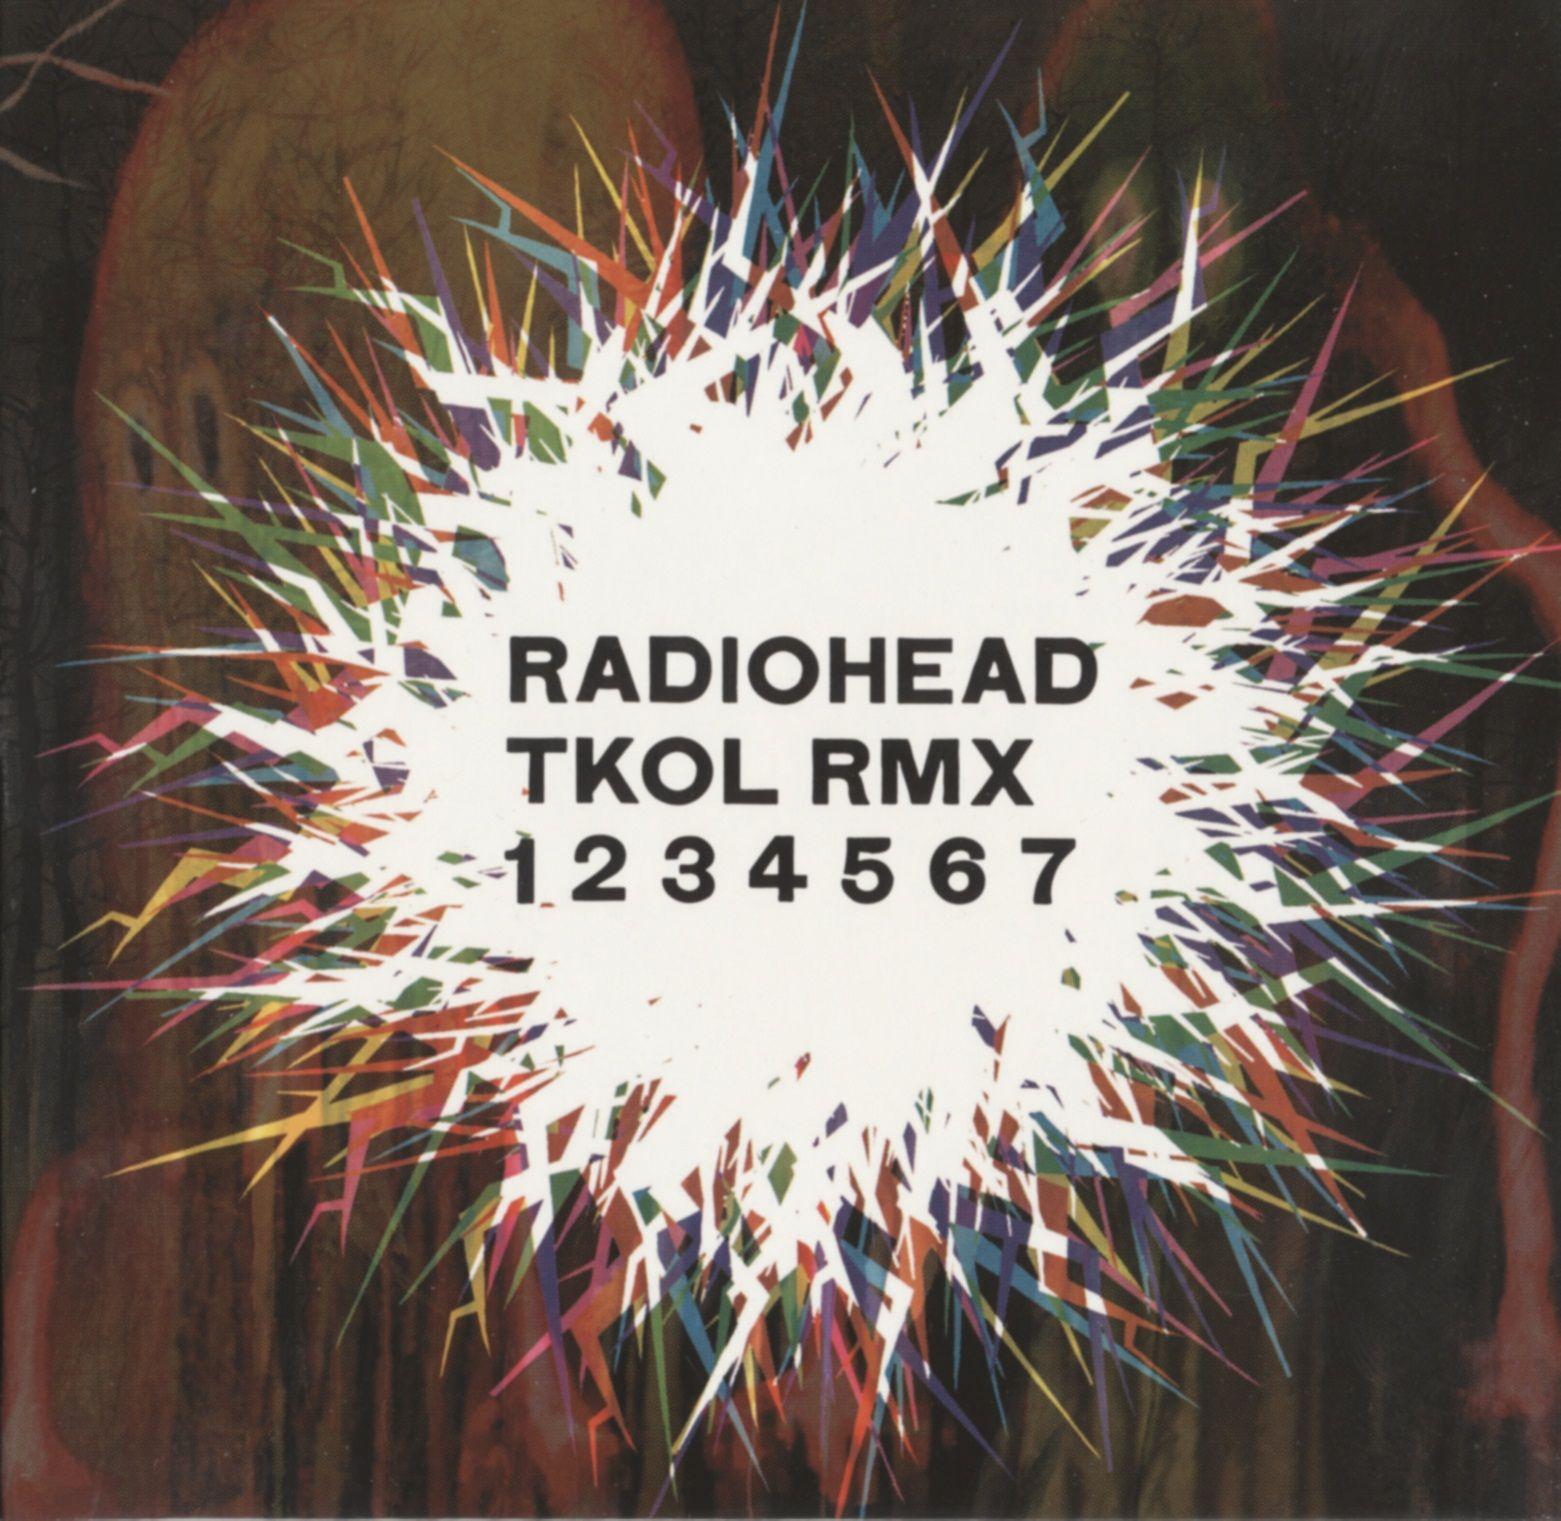 Radiohead - TKOL RMX 1234567 album cover